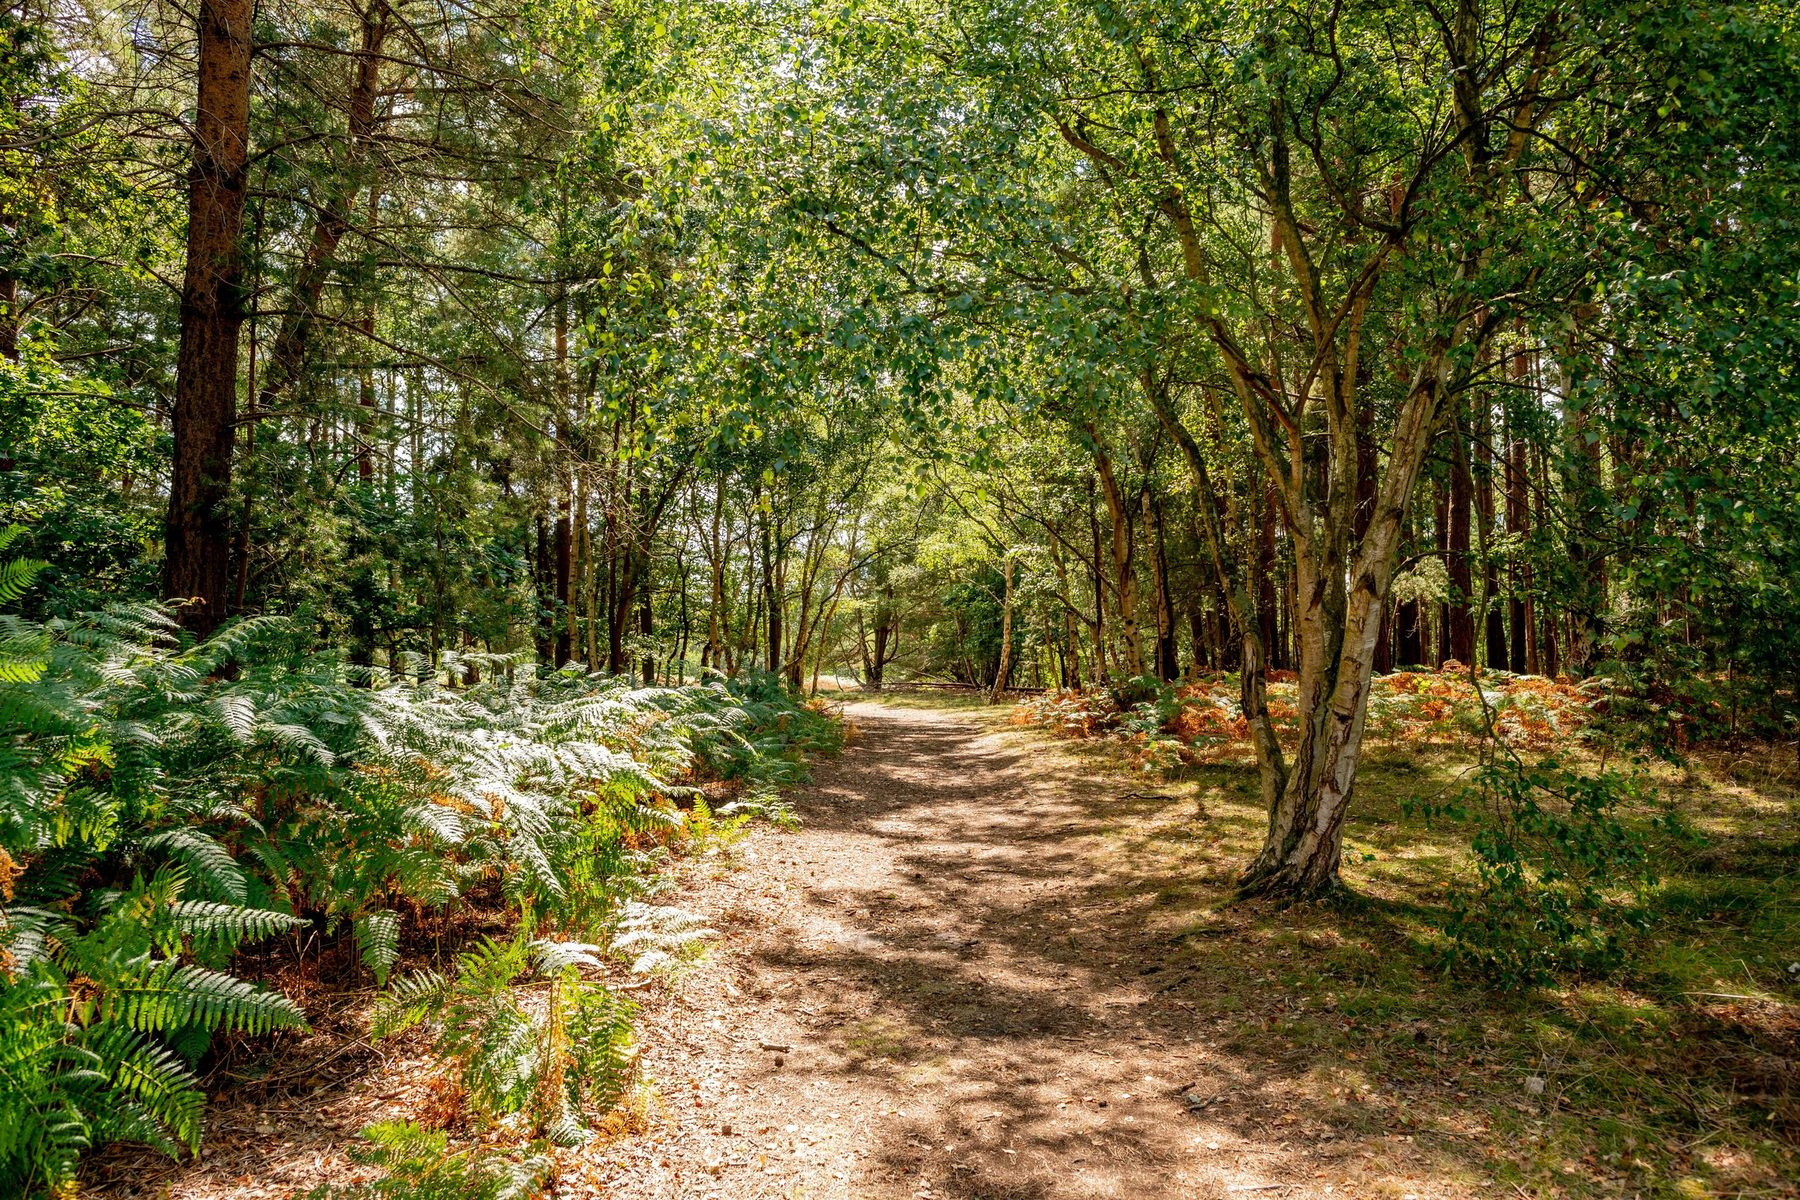 035 Dersingham Bog 2018